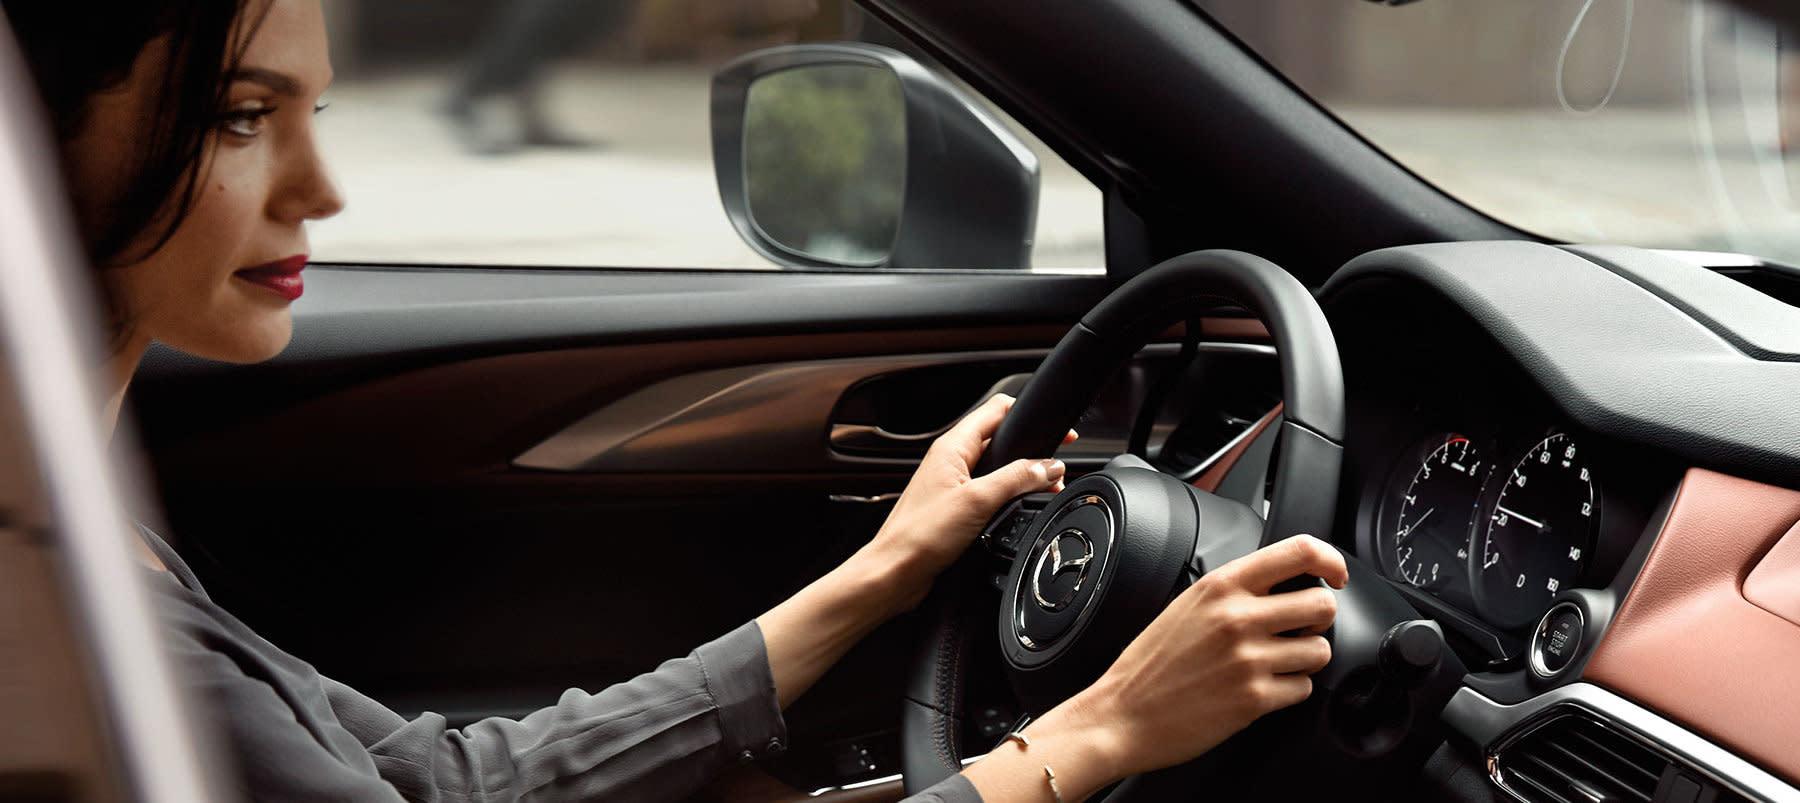 Secure Cabin of the 2019 Mazda CX-9